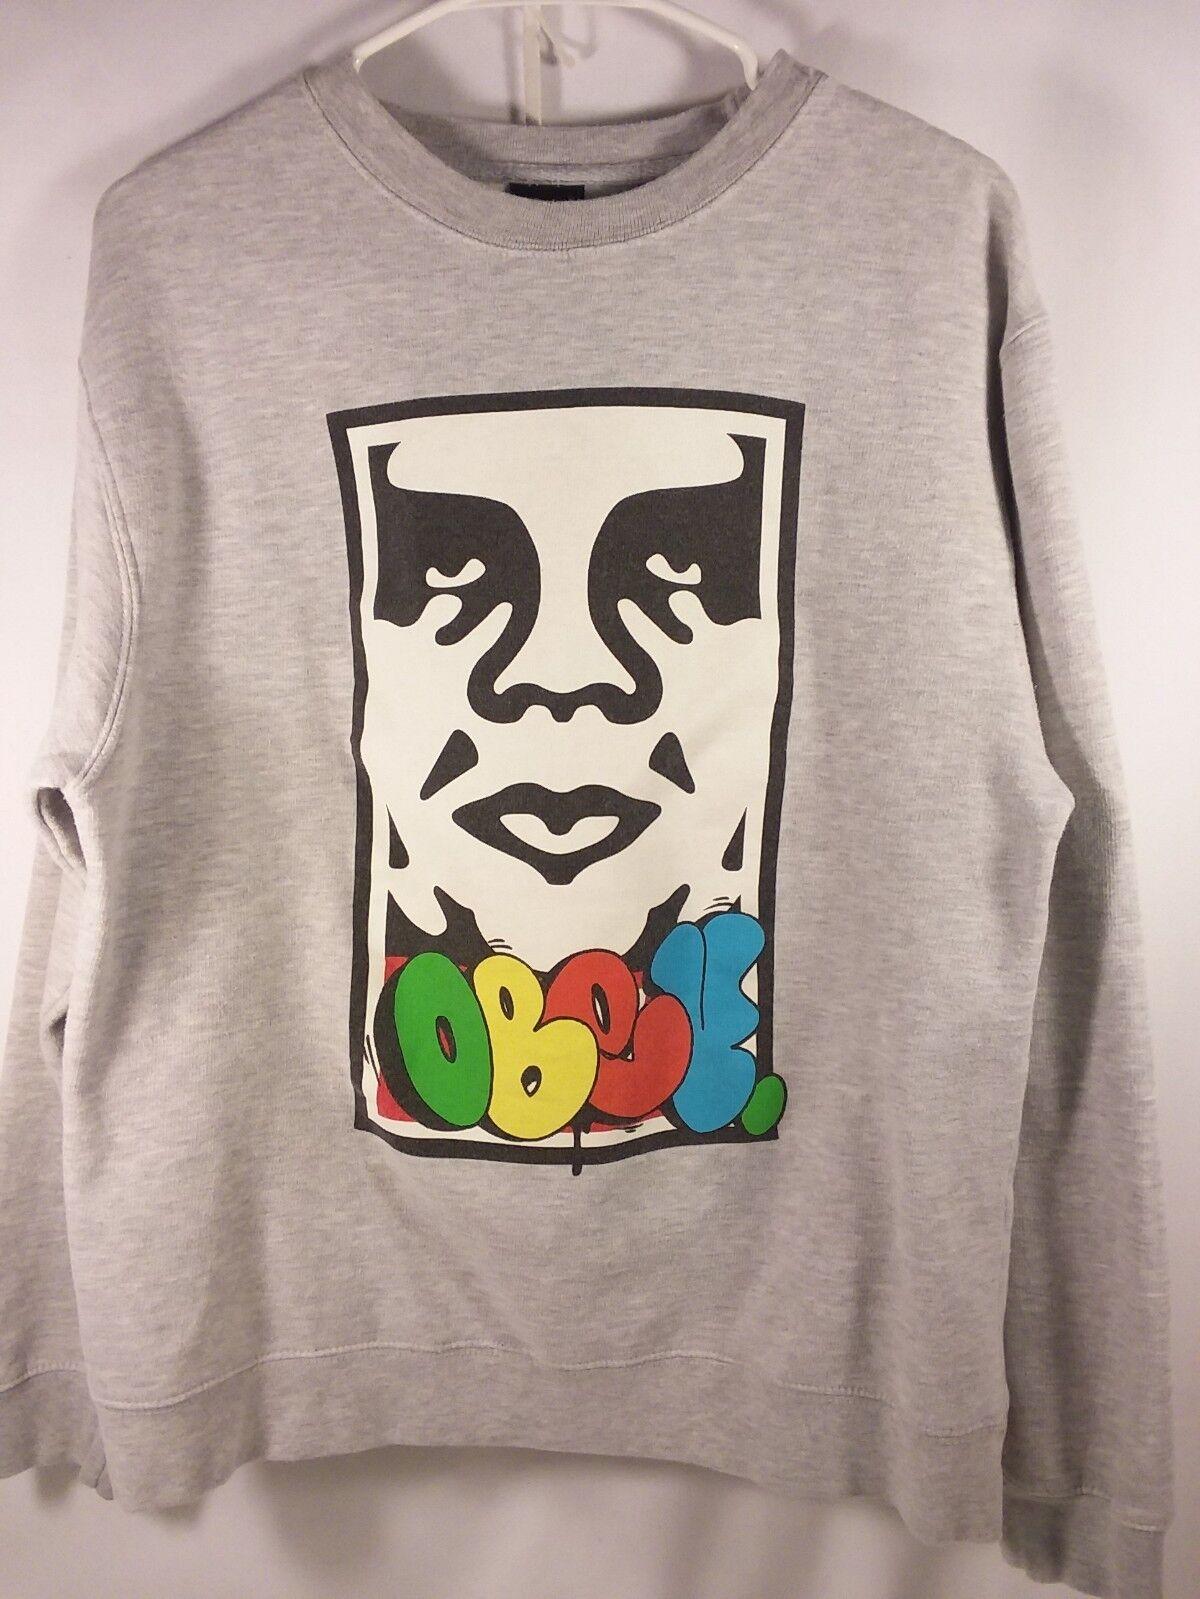 OBEY COPE Sweatshirt Takeover  Herren Medium Heather grau Face Graffiti Graphic